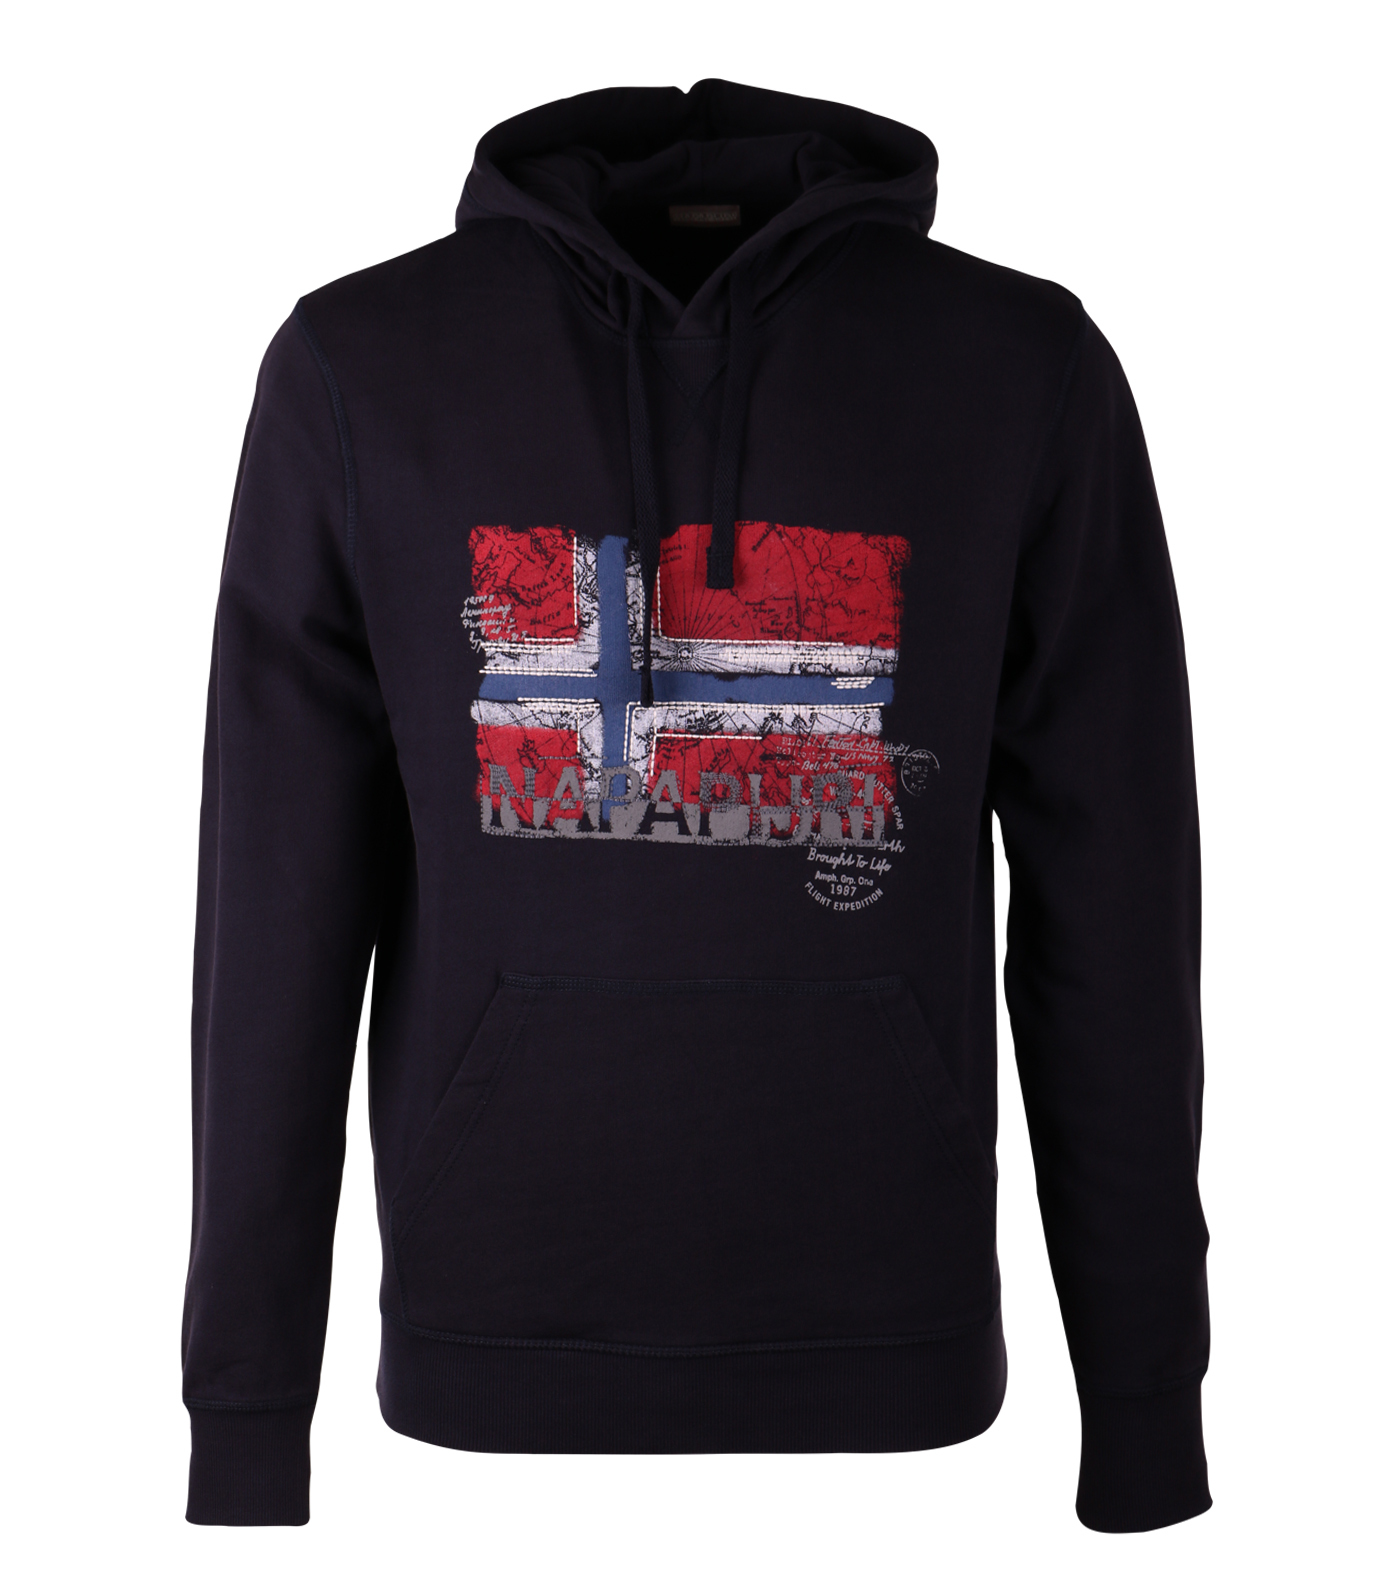 Napapijri boyk hoodie donkerblauw for Designhotel maastricht comfort xl